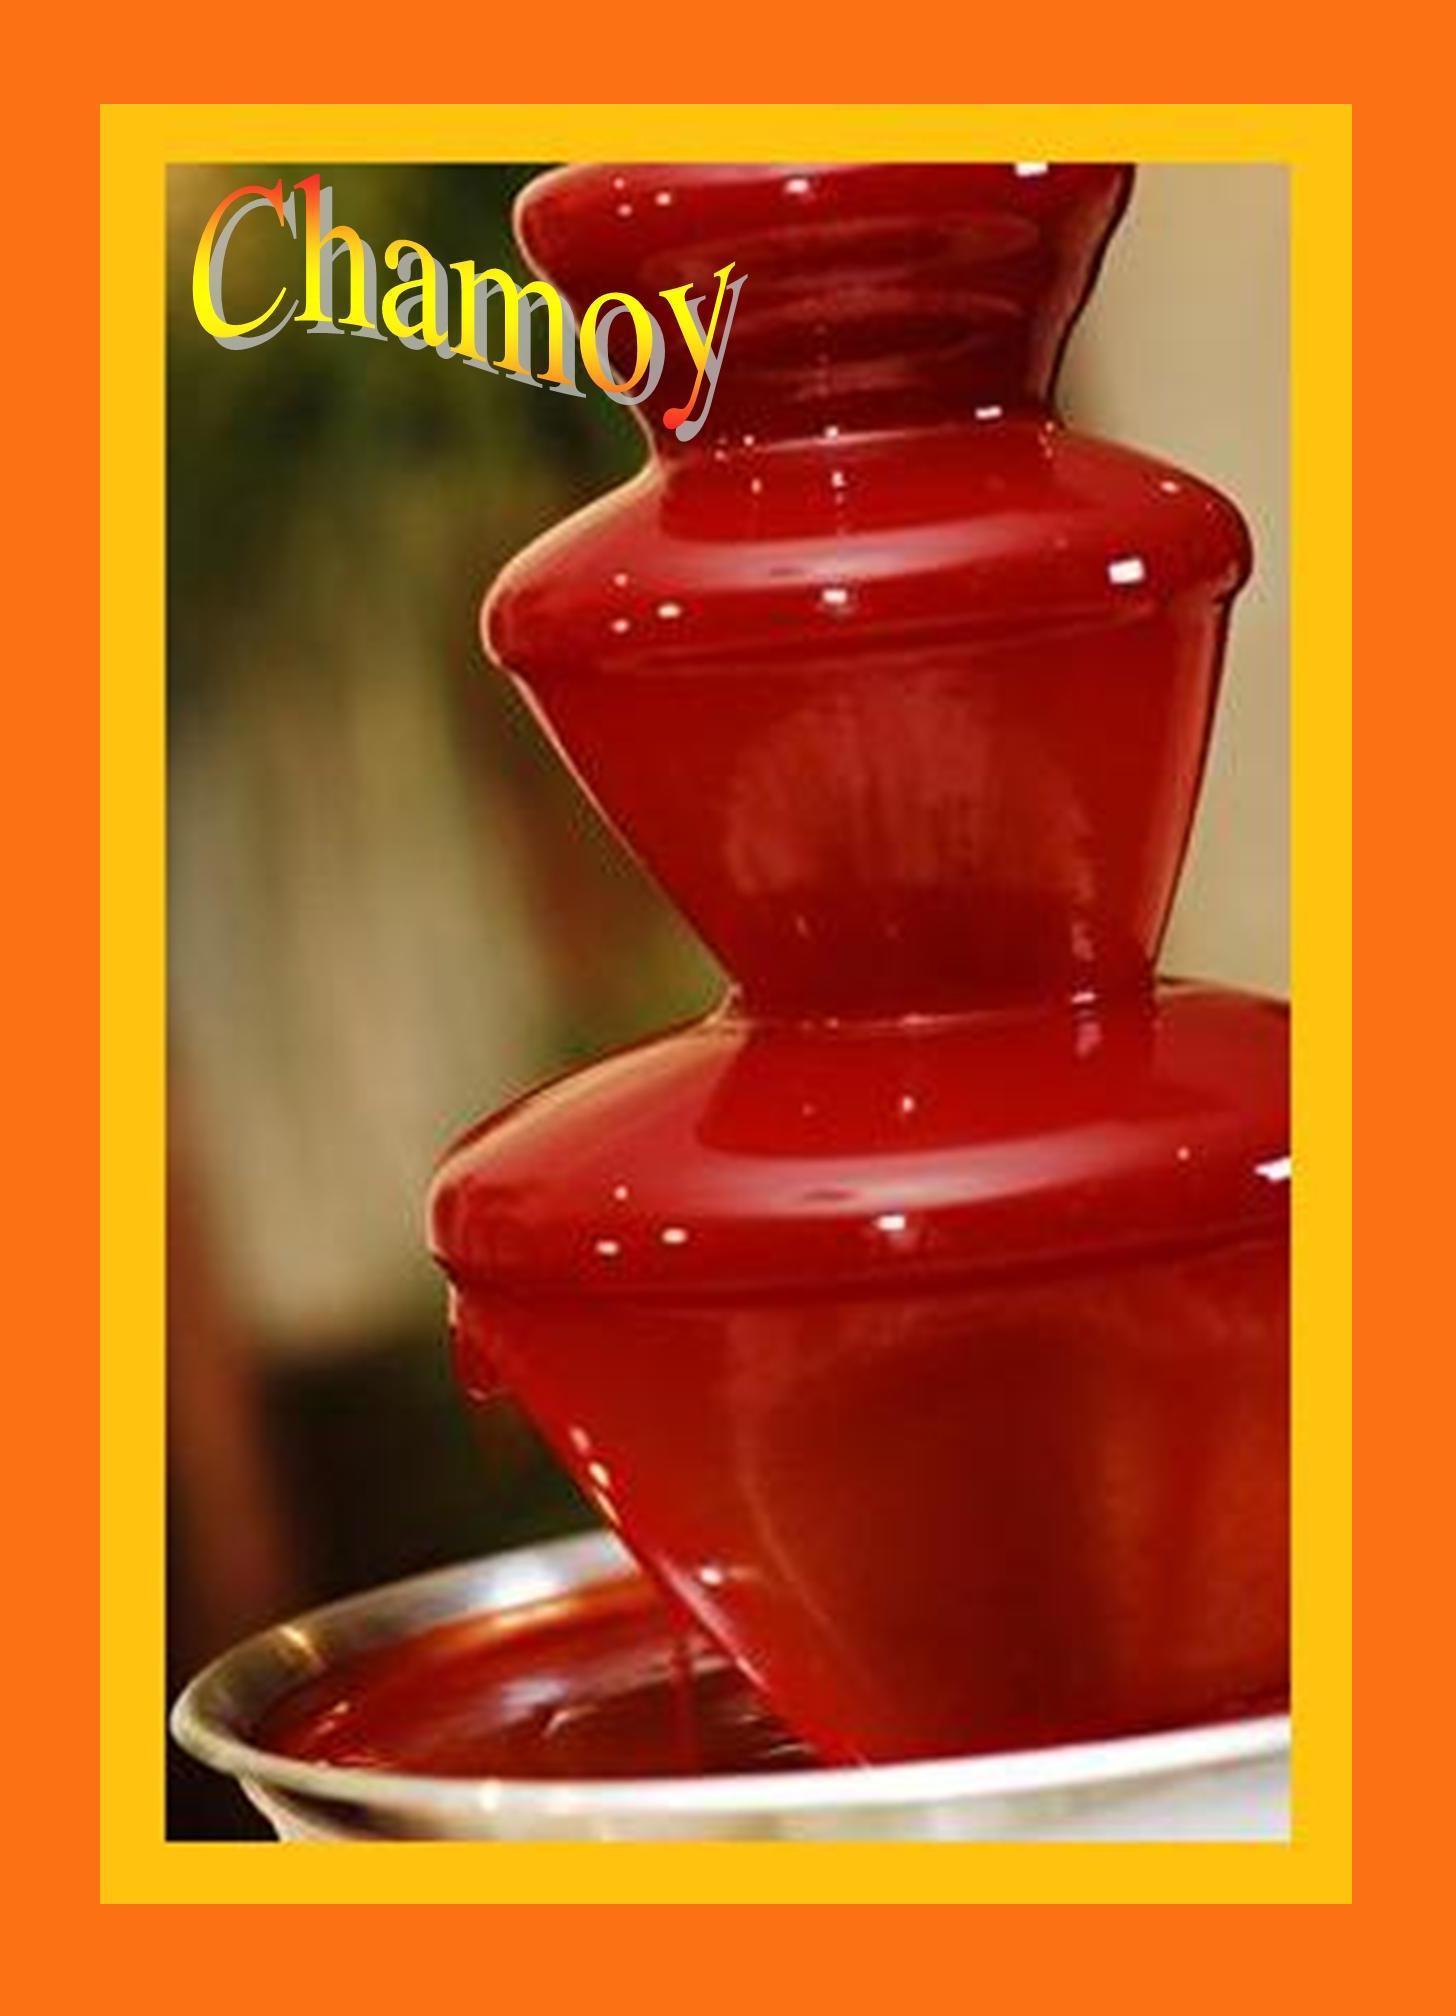 FUENTES DE CHAMOY